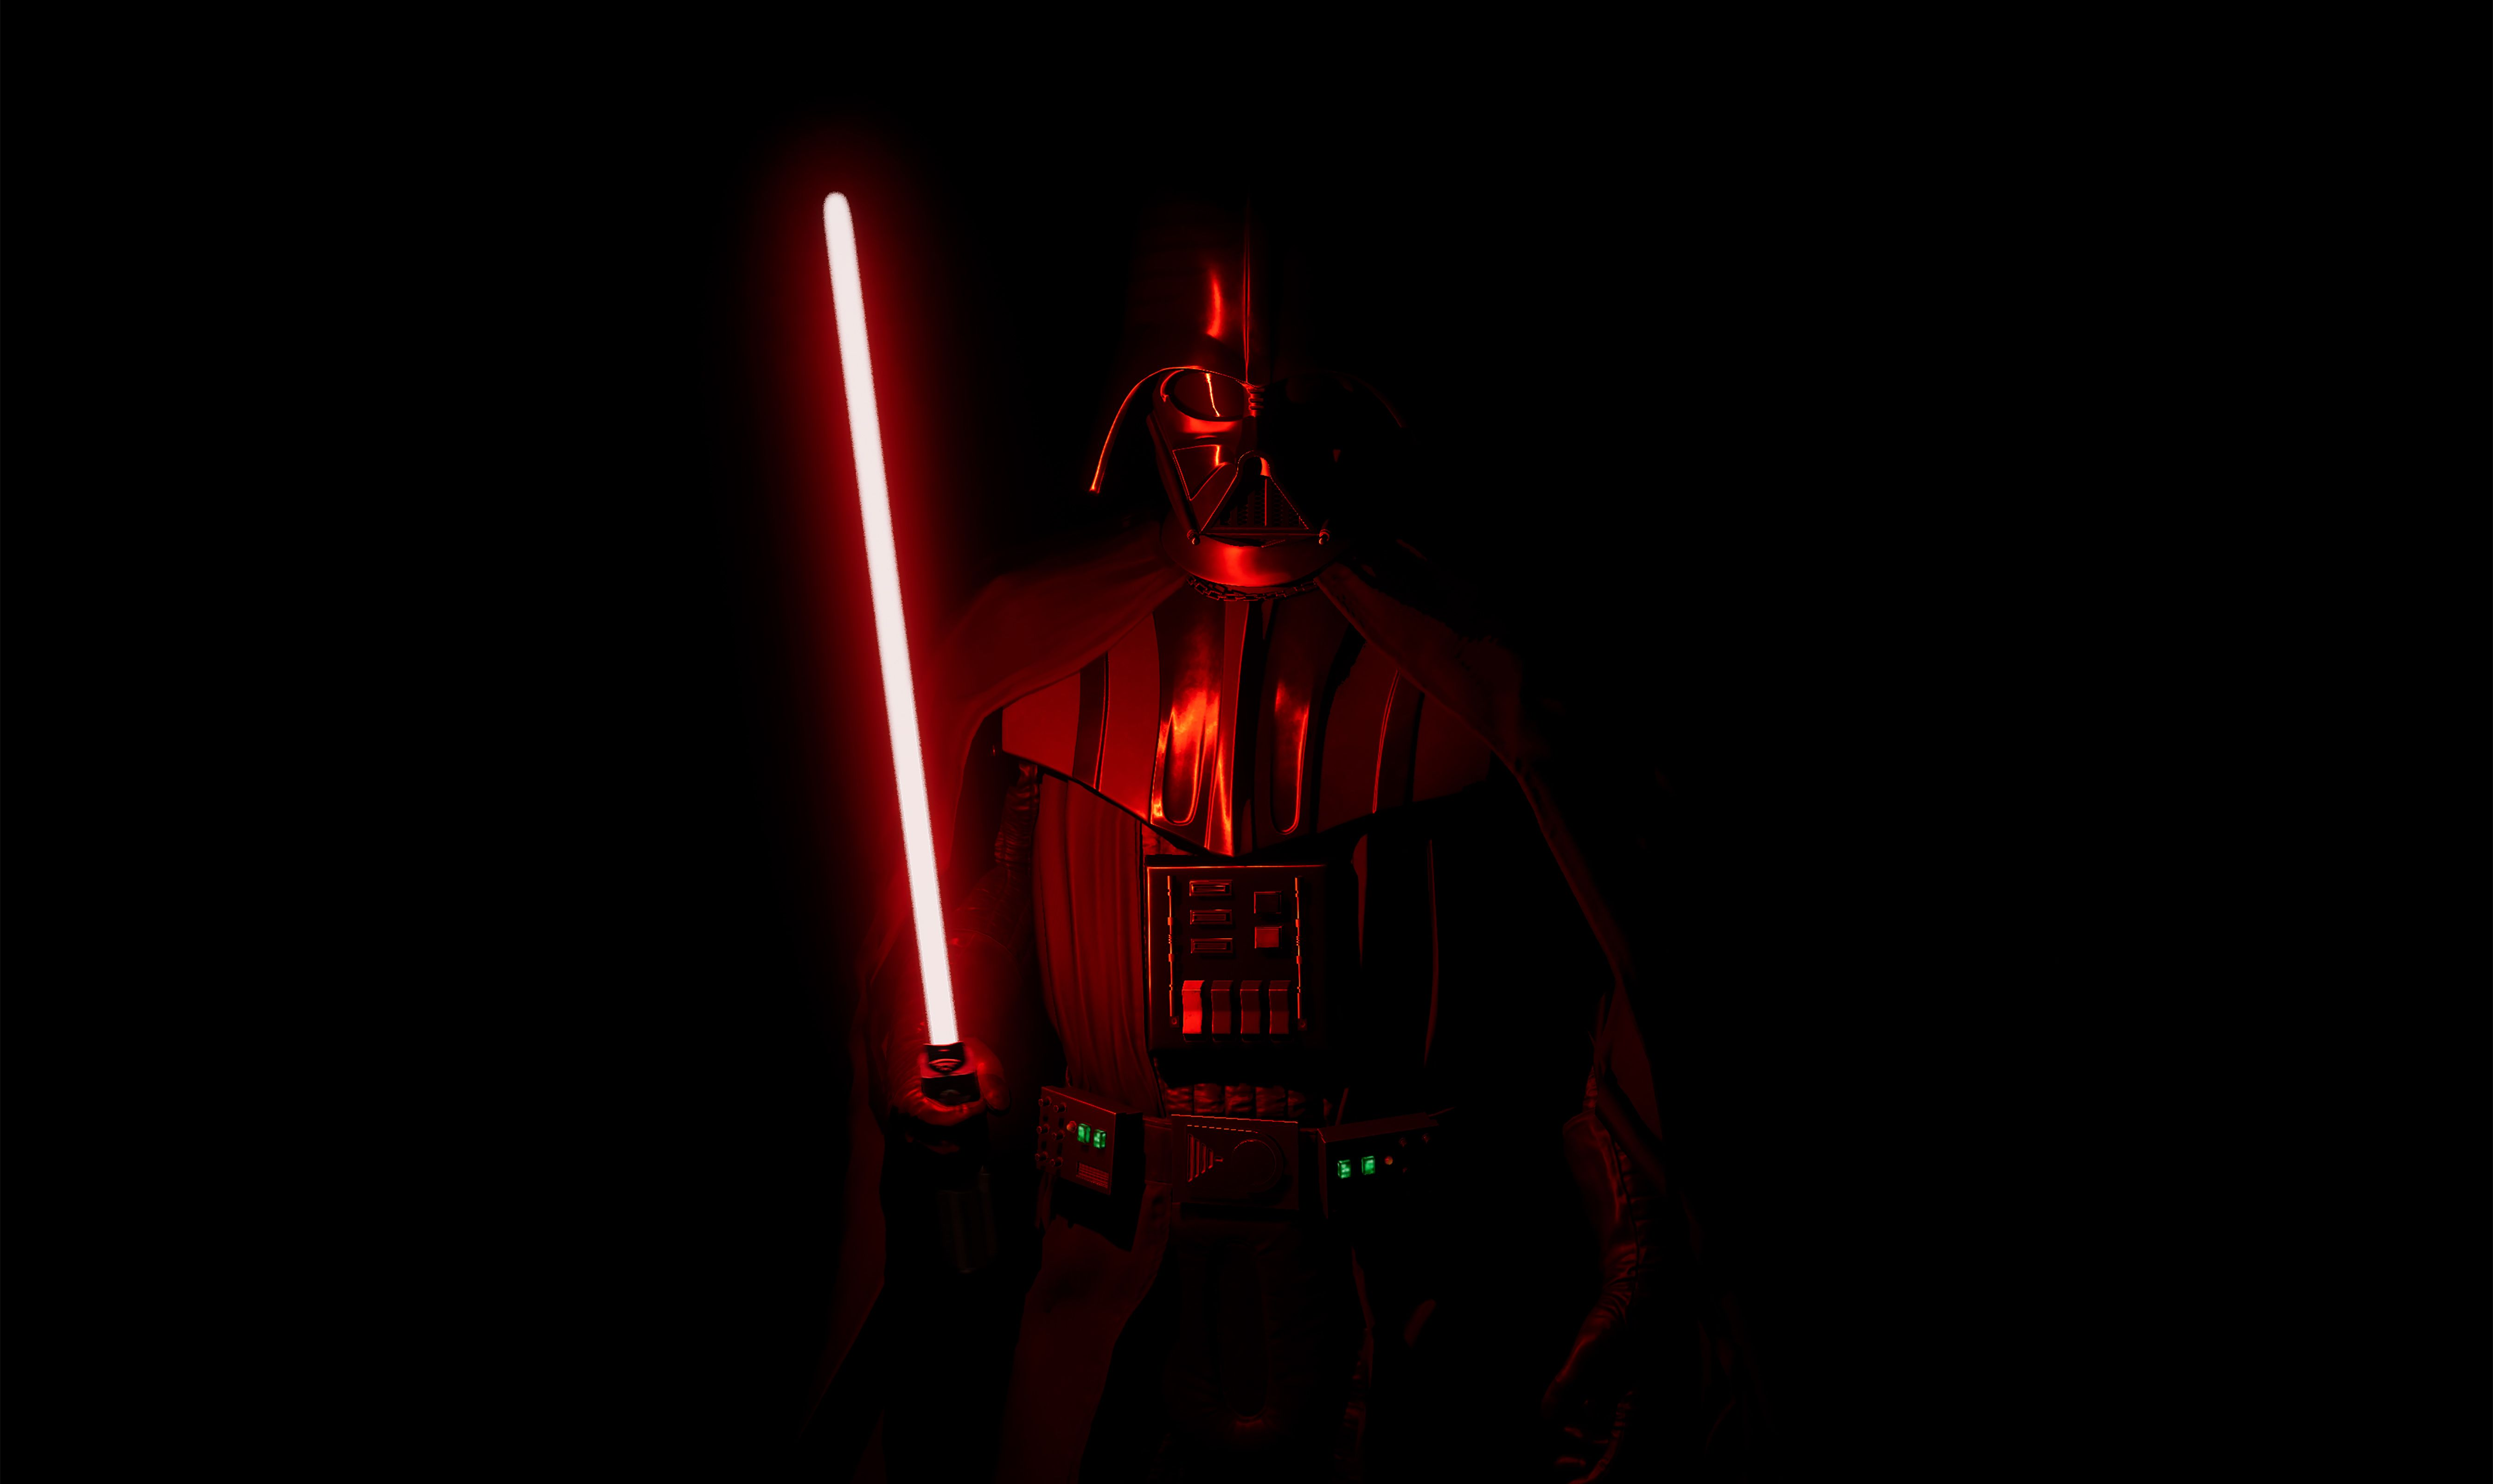 Get Inspired For 1080p Darth Vader Rogue One Wallpaper Wallpaper In 2020 Darth Vader Wallpaper Star Wars Wallpaper Darth Vader 4k